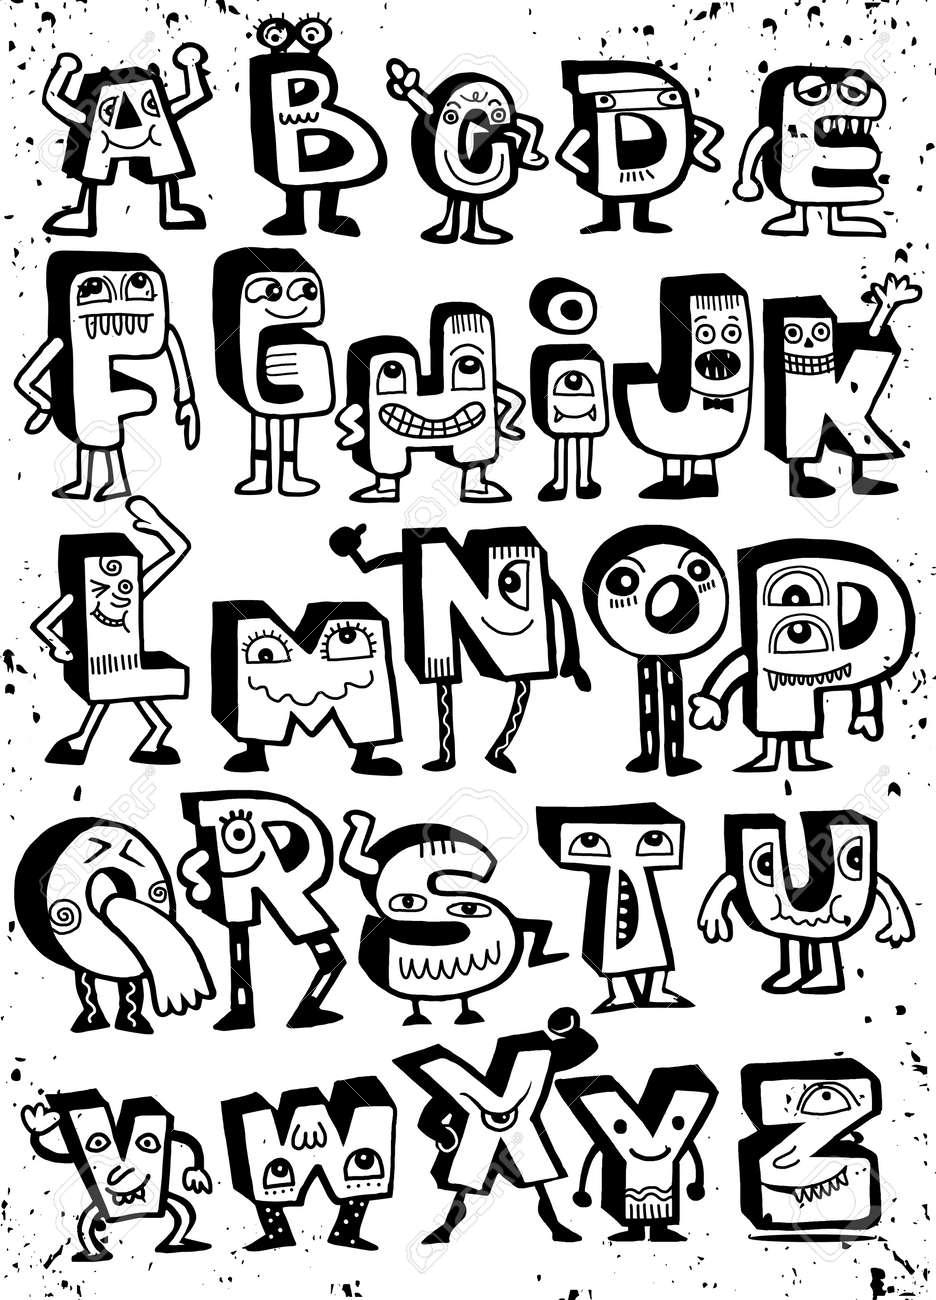 Hand drawn funny monster alphabet isolated letters doodle font hand drawn funny monster alphabet isolated letters doodle fontctor illustration stock vector altavistaventures Gallery